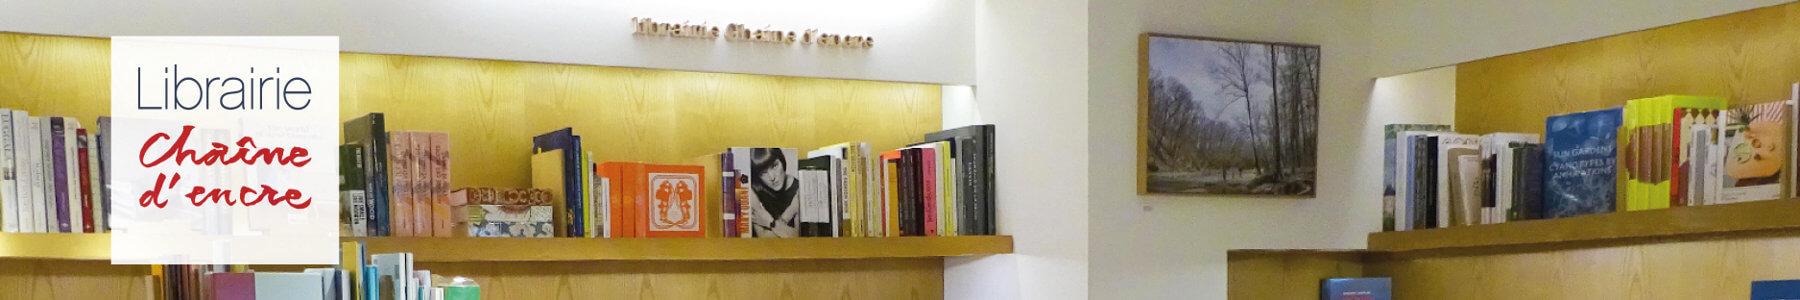 Librairie Chaîne d'encre